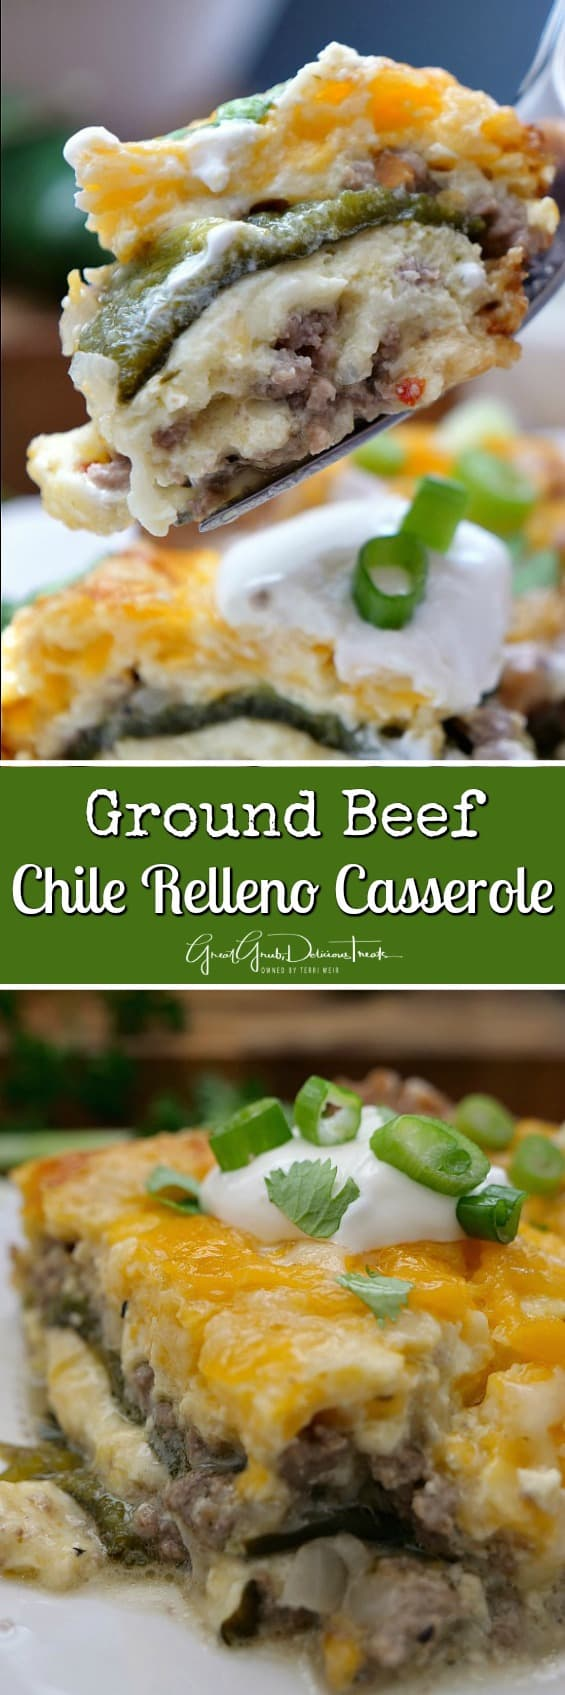 Ground Beef Chile Relleno Casserole